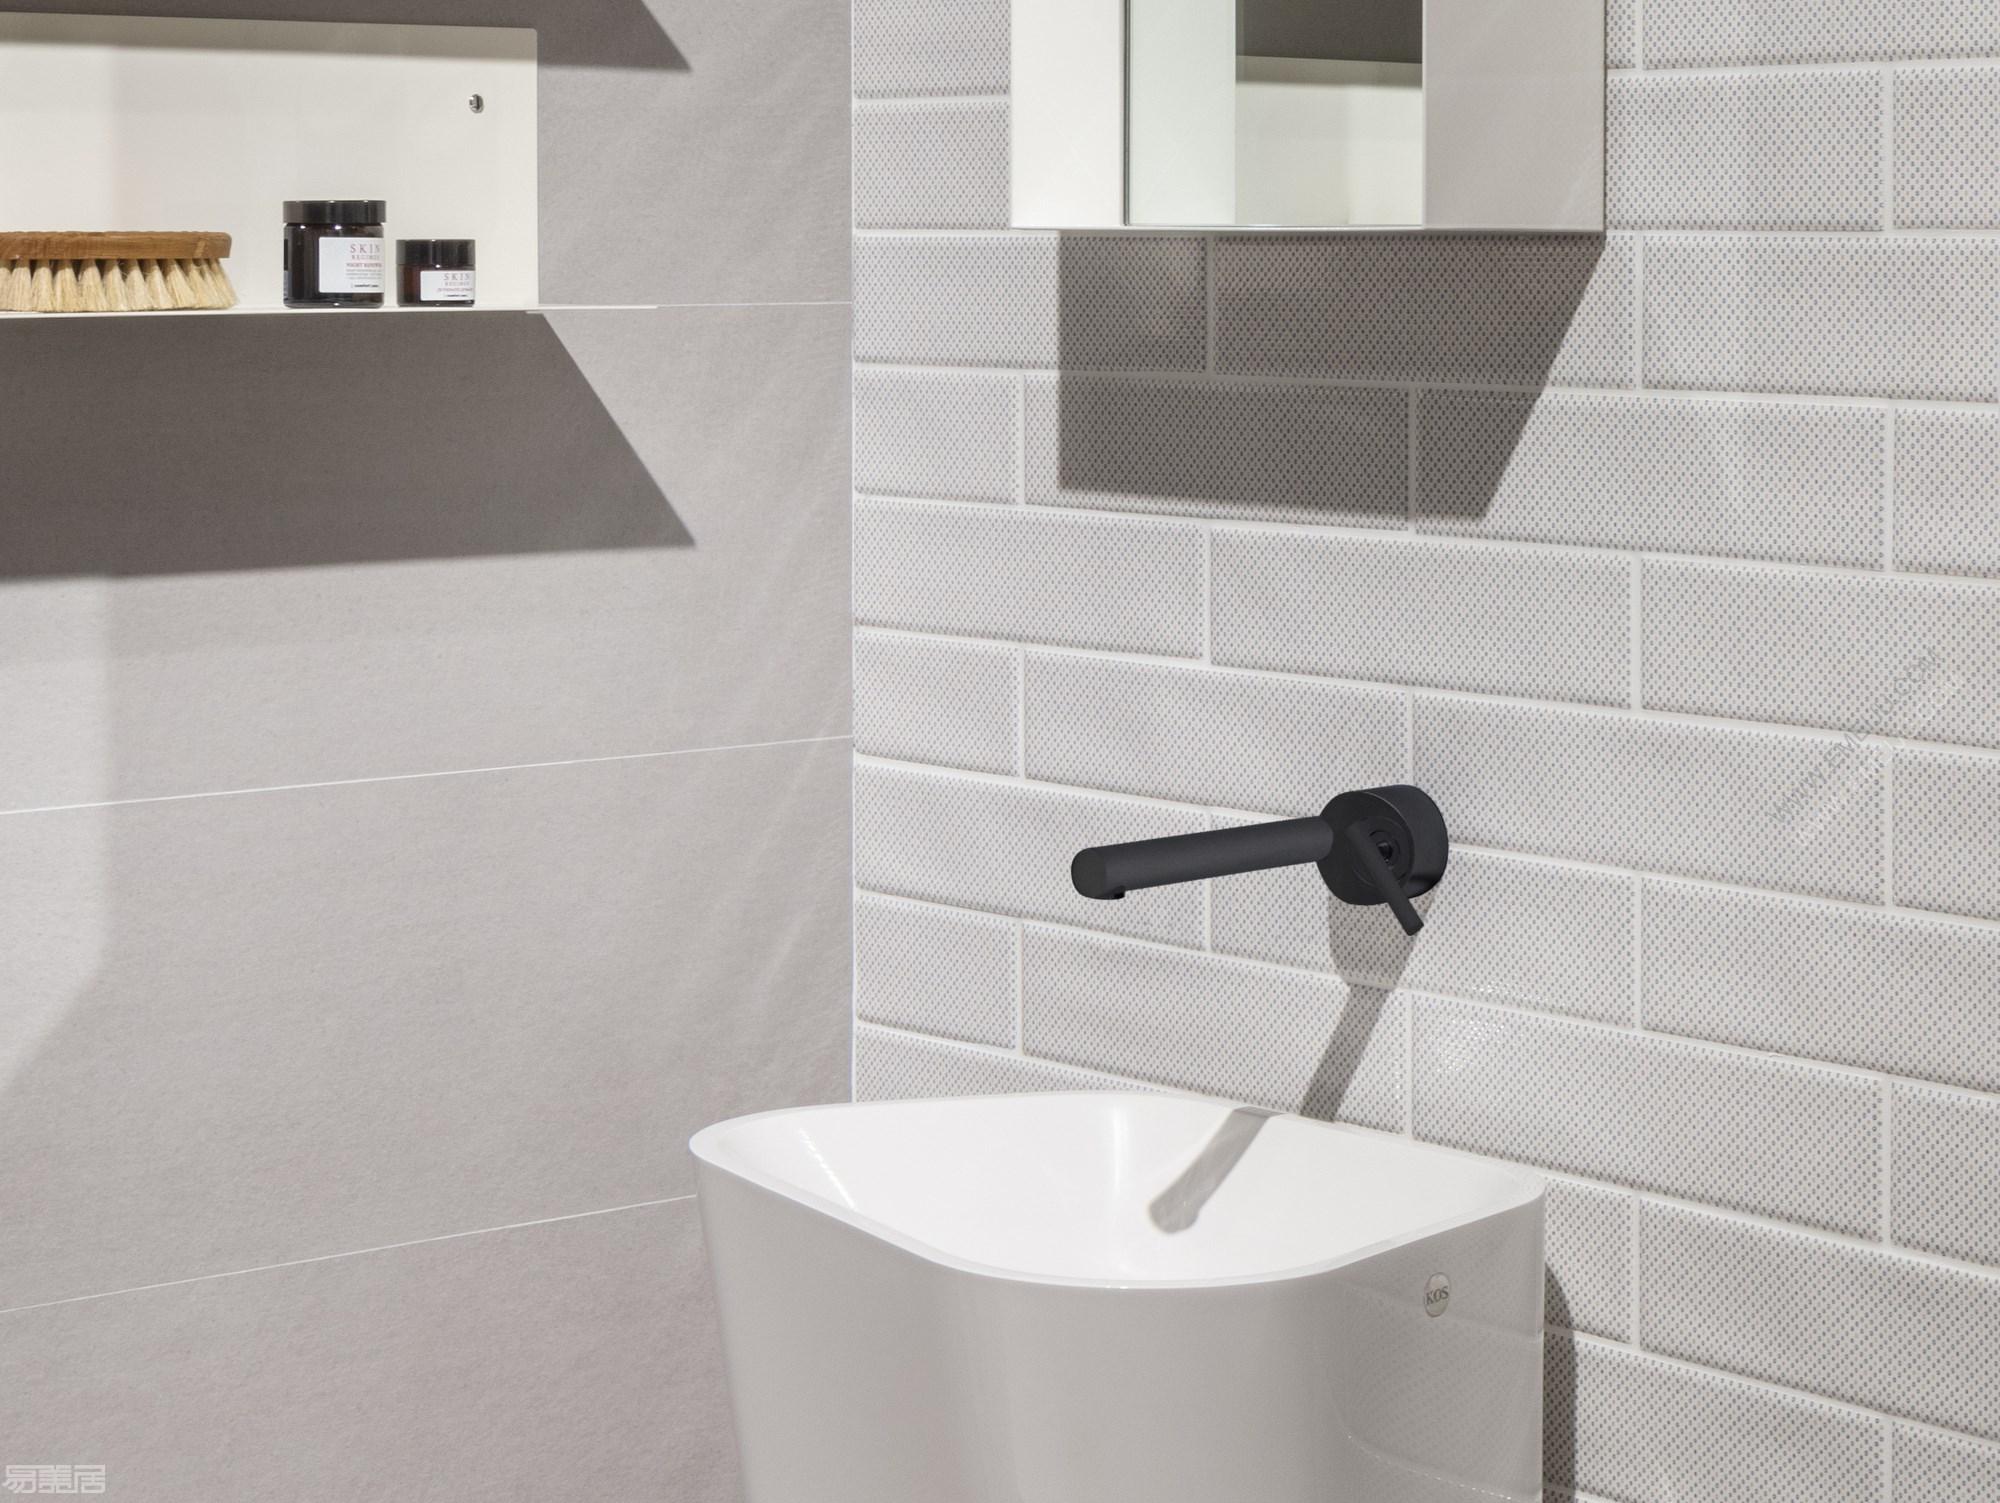 CLOSER-Wall-mounted-washbasin-mixer-ZUCCHETTI-Rubinetteria-S-p-A-297321-relc537ad6d.jpg